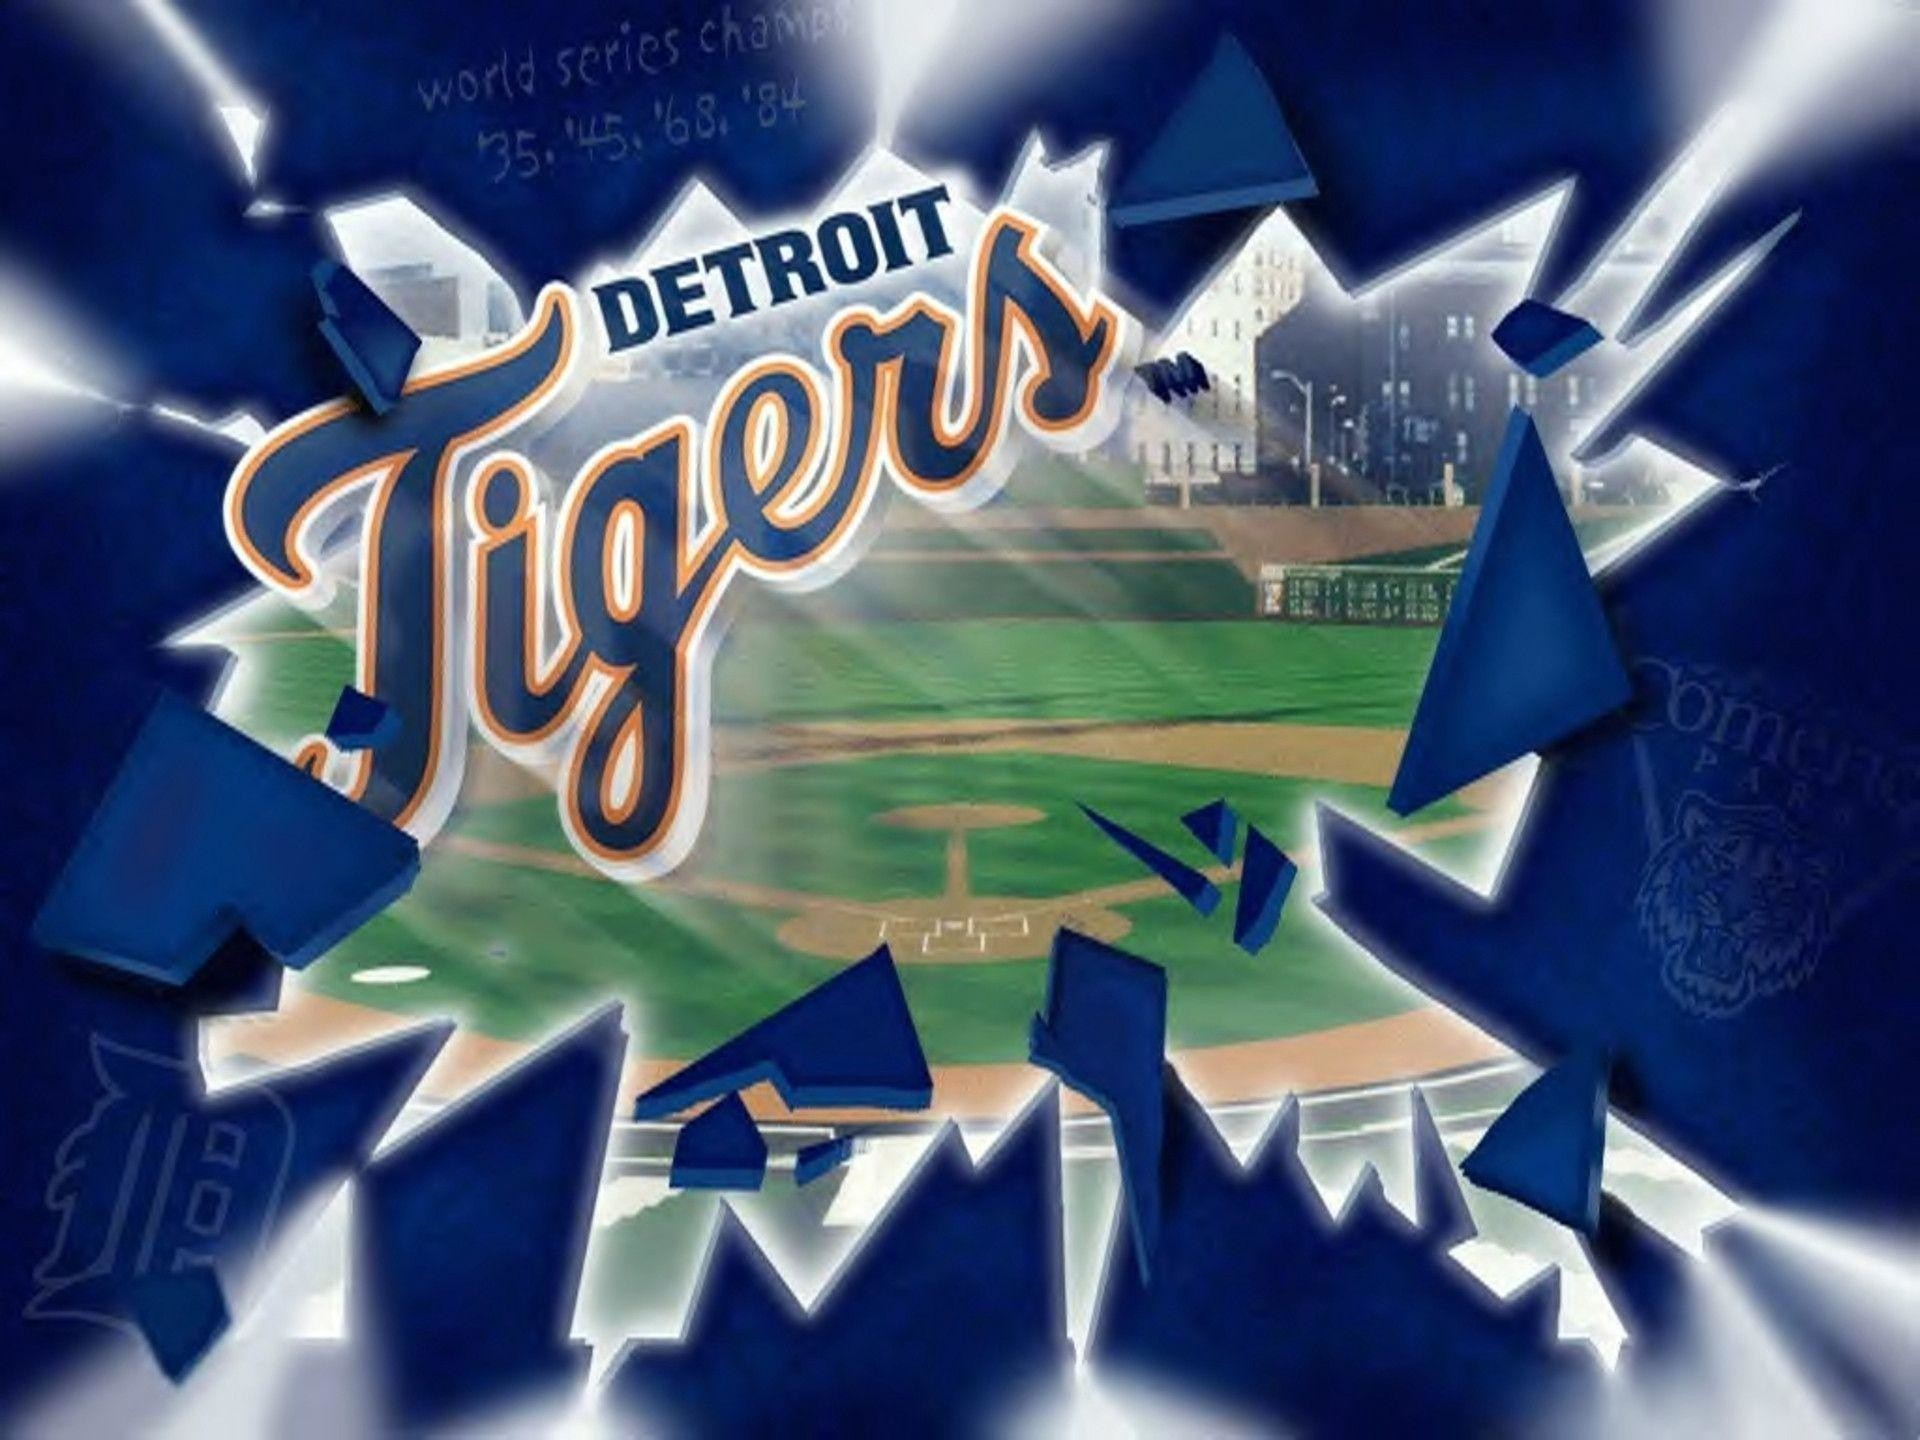 1920x1440 Interesting Detroit Tigers Wallpapers 1920x1440PX ~ Detroit Tigers .